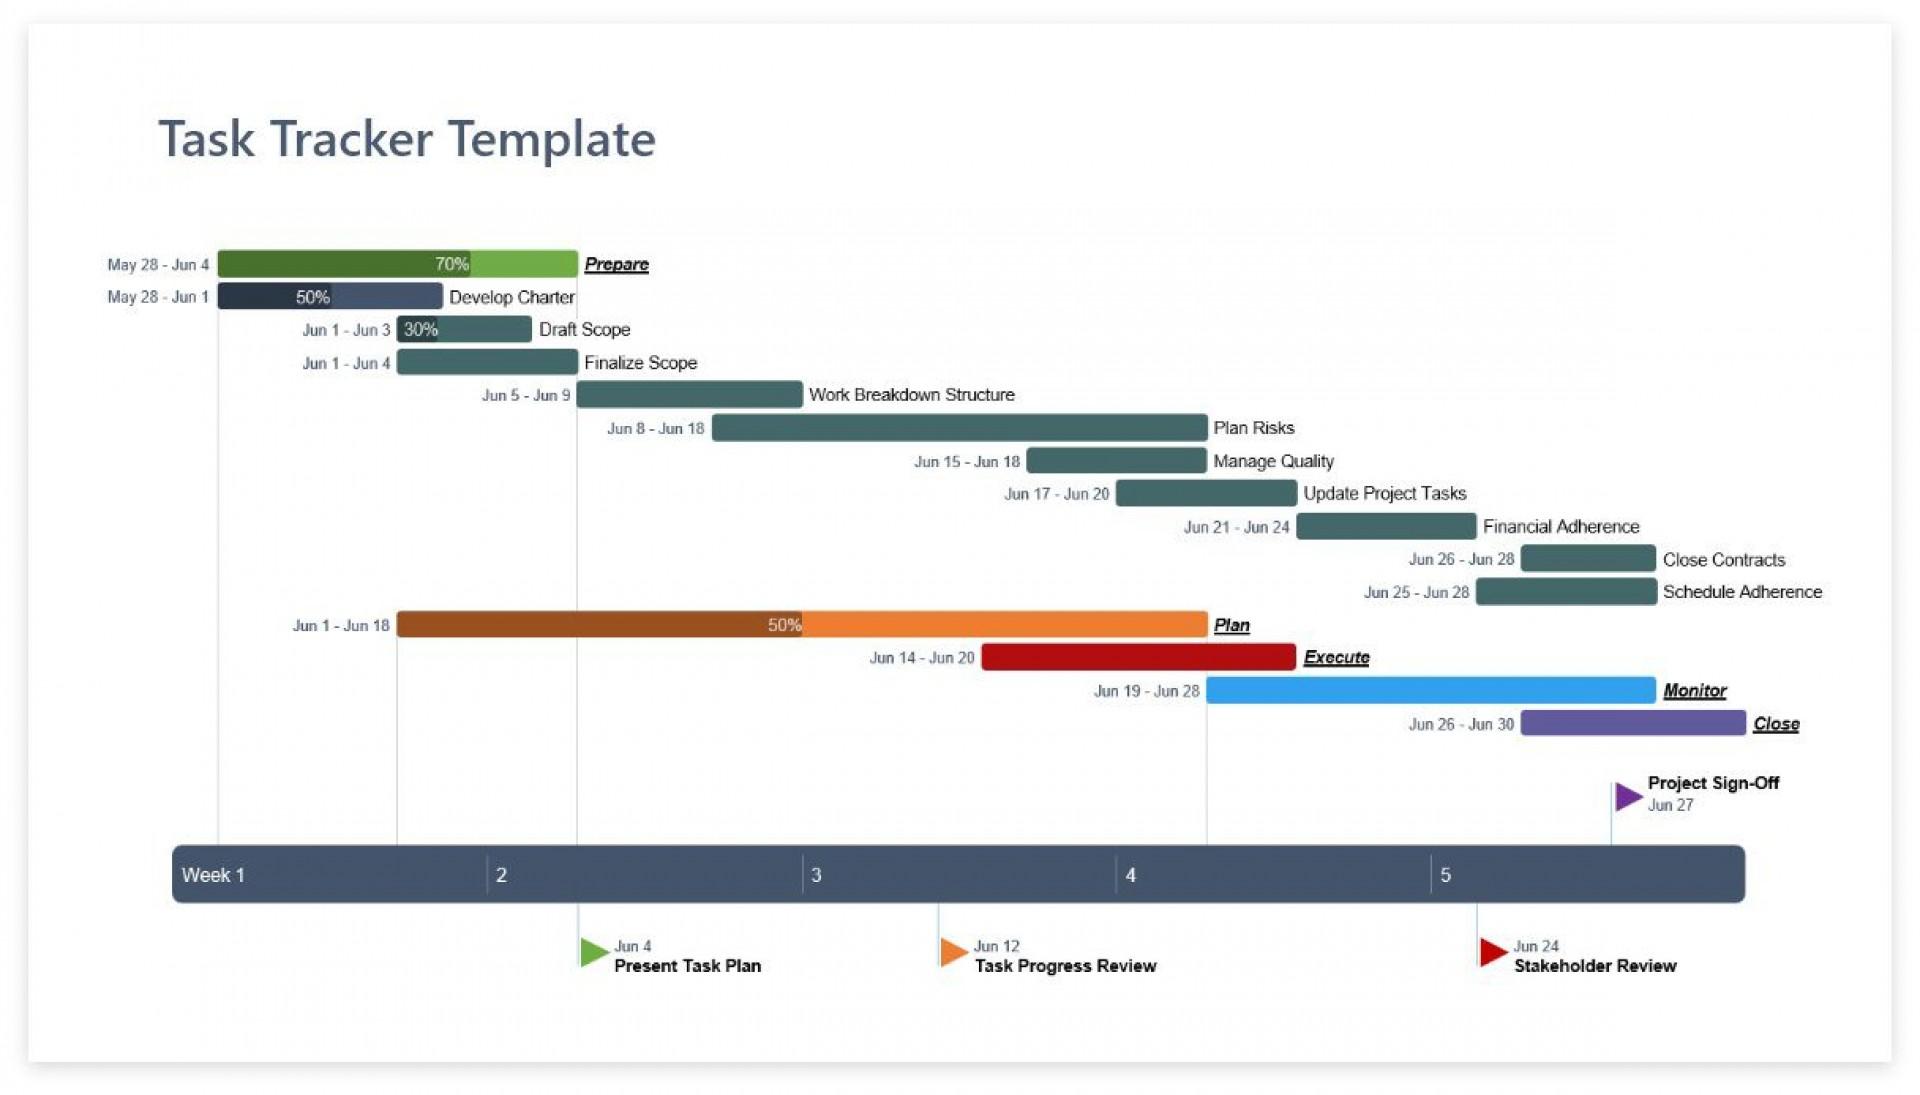 008 Wondrou Excel Task Tracker Template Photo  Team Download Time1920